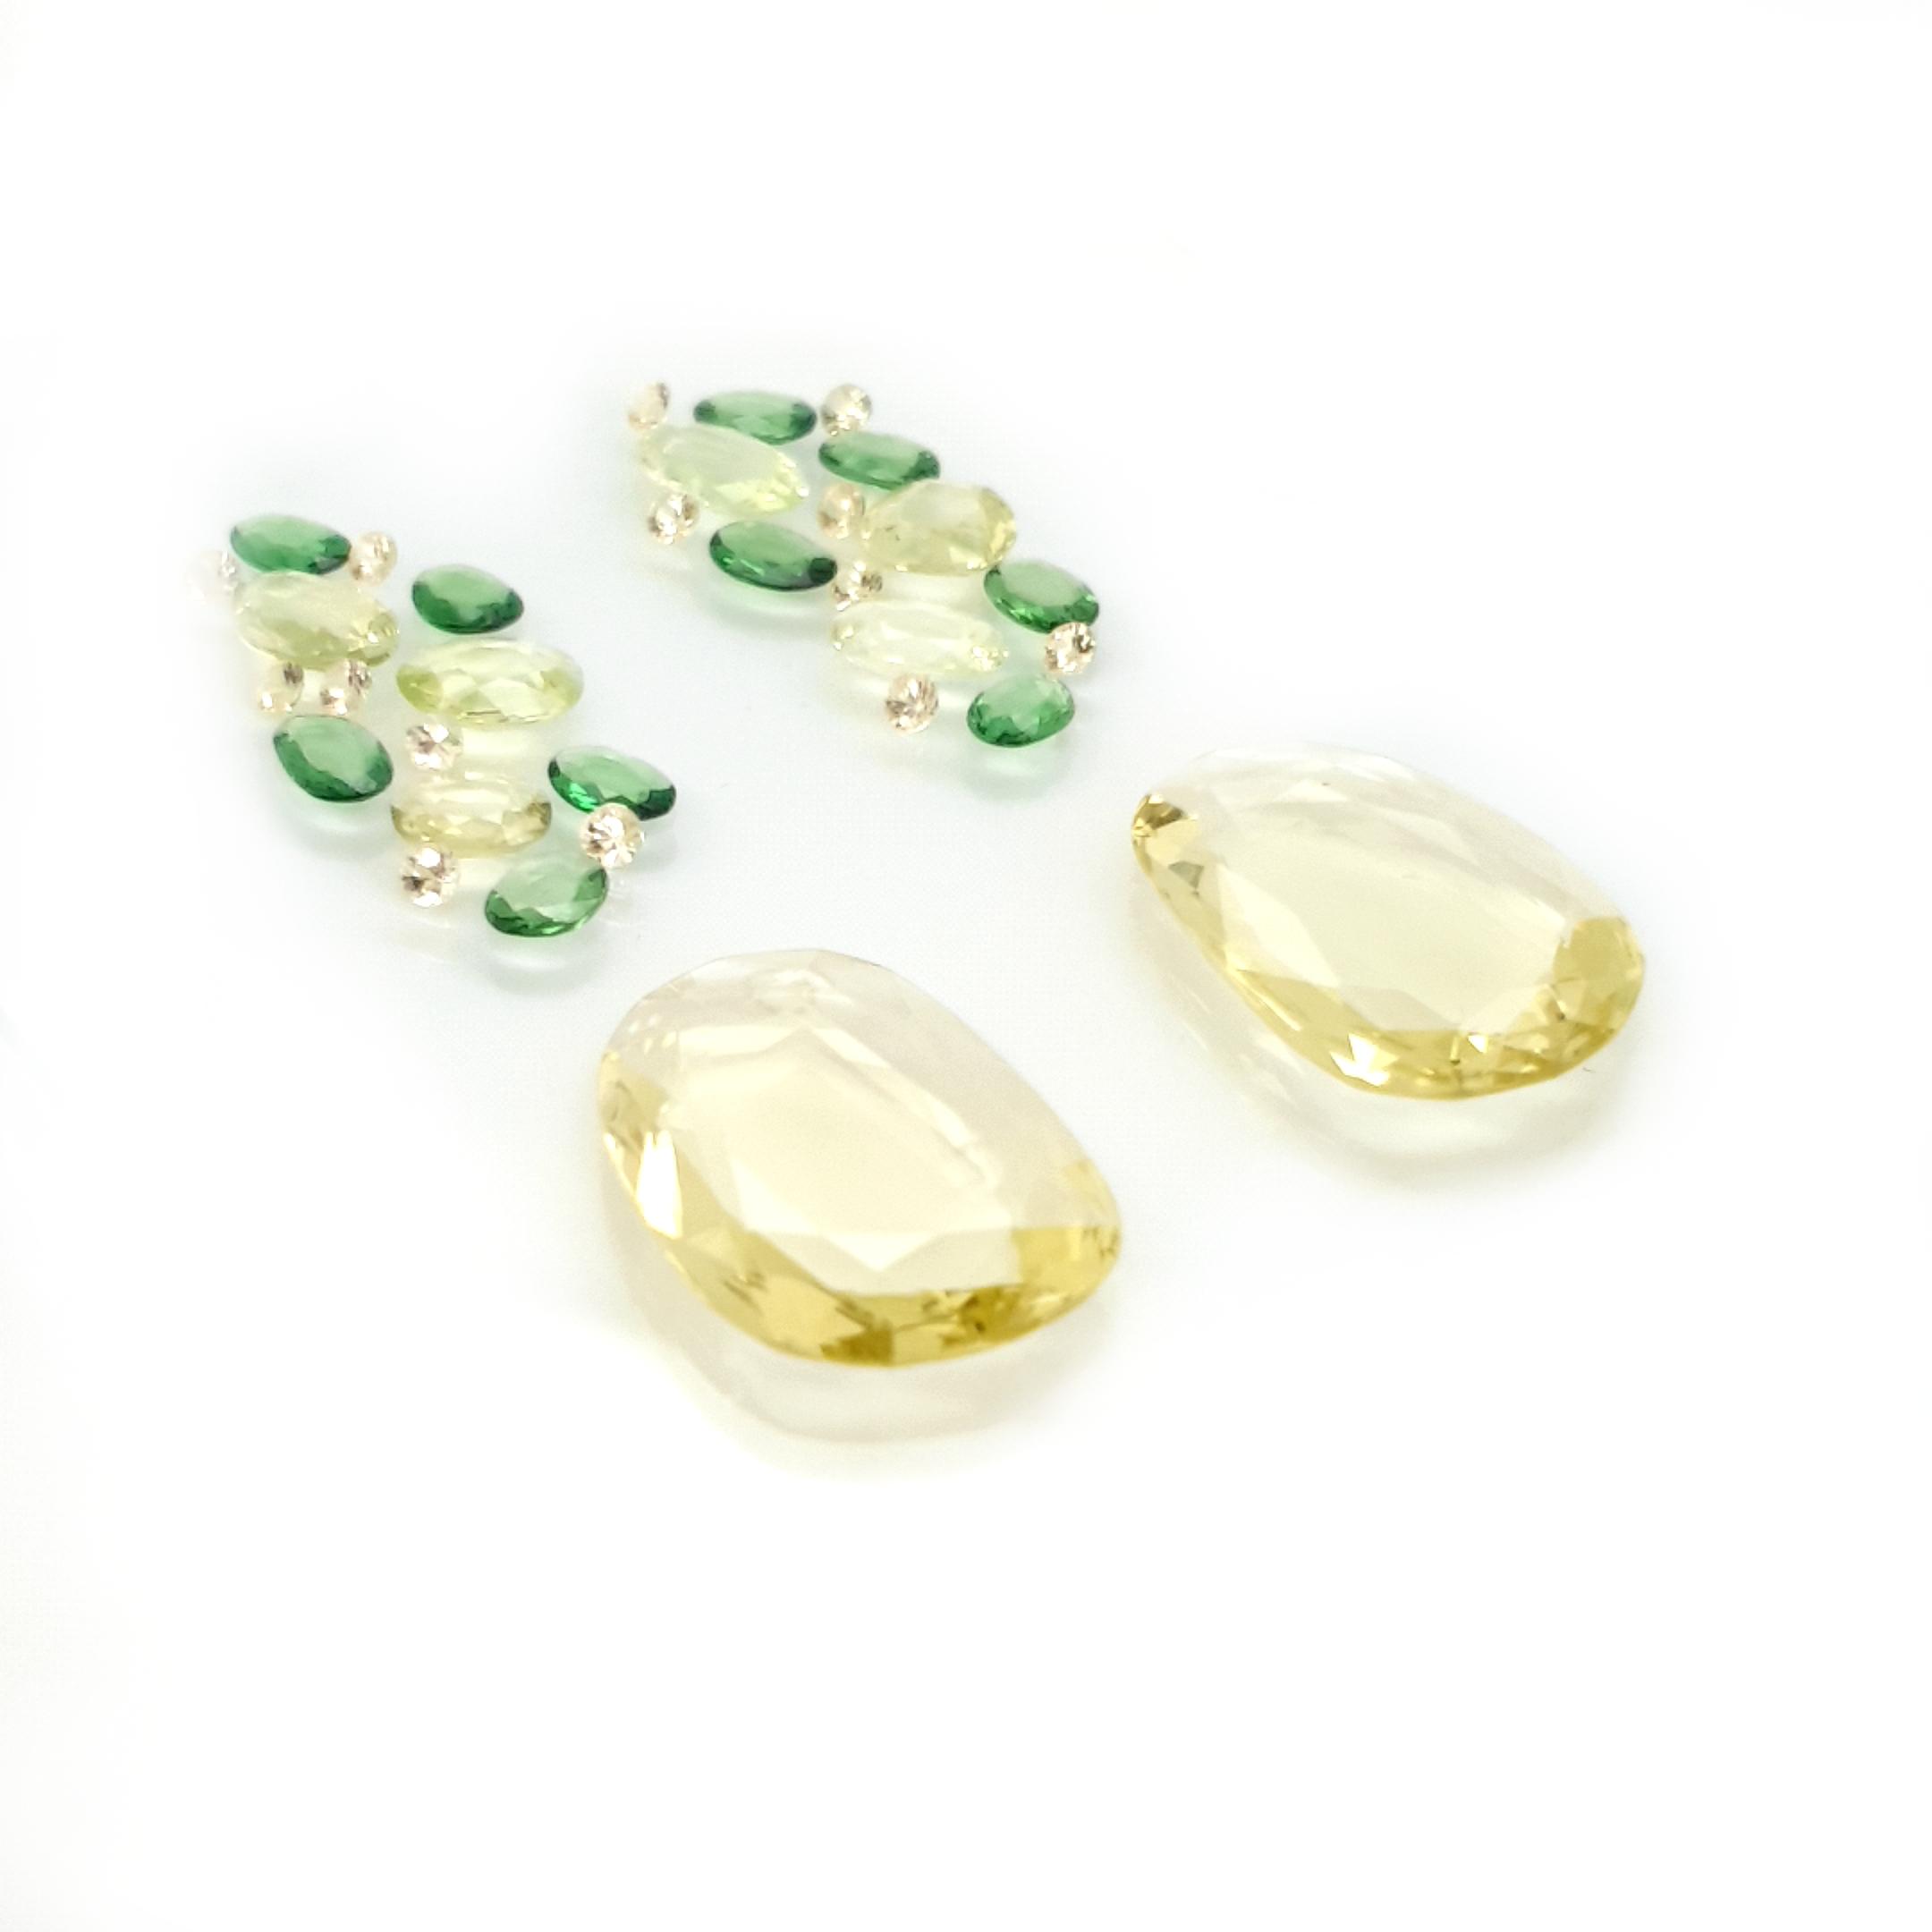 set for earring 36,83ct. DoubleRoseCut Chrysoberyl, Sapphire and Lemon Quarz